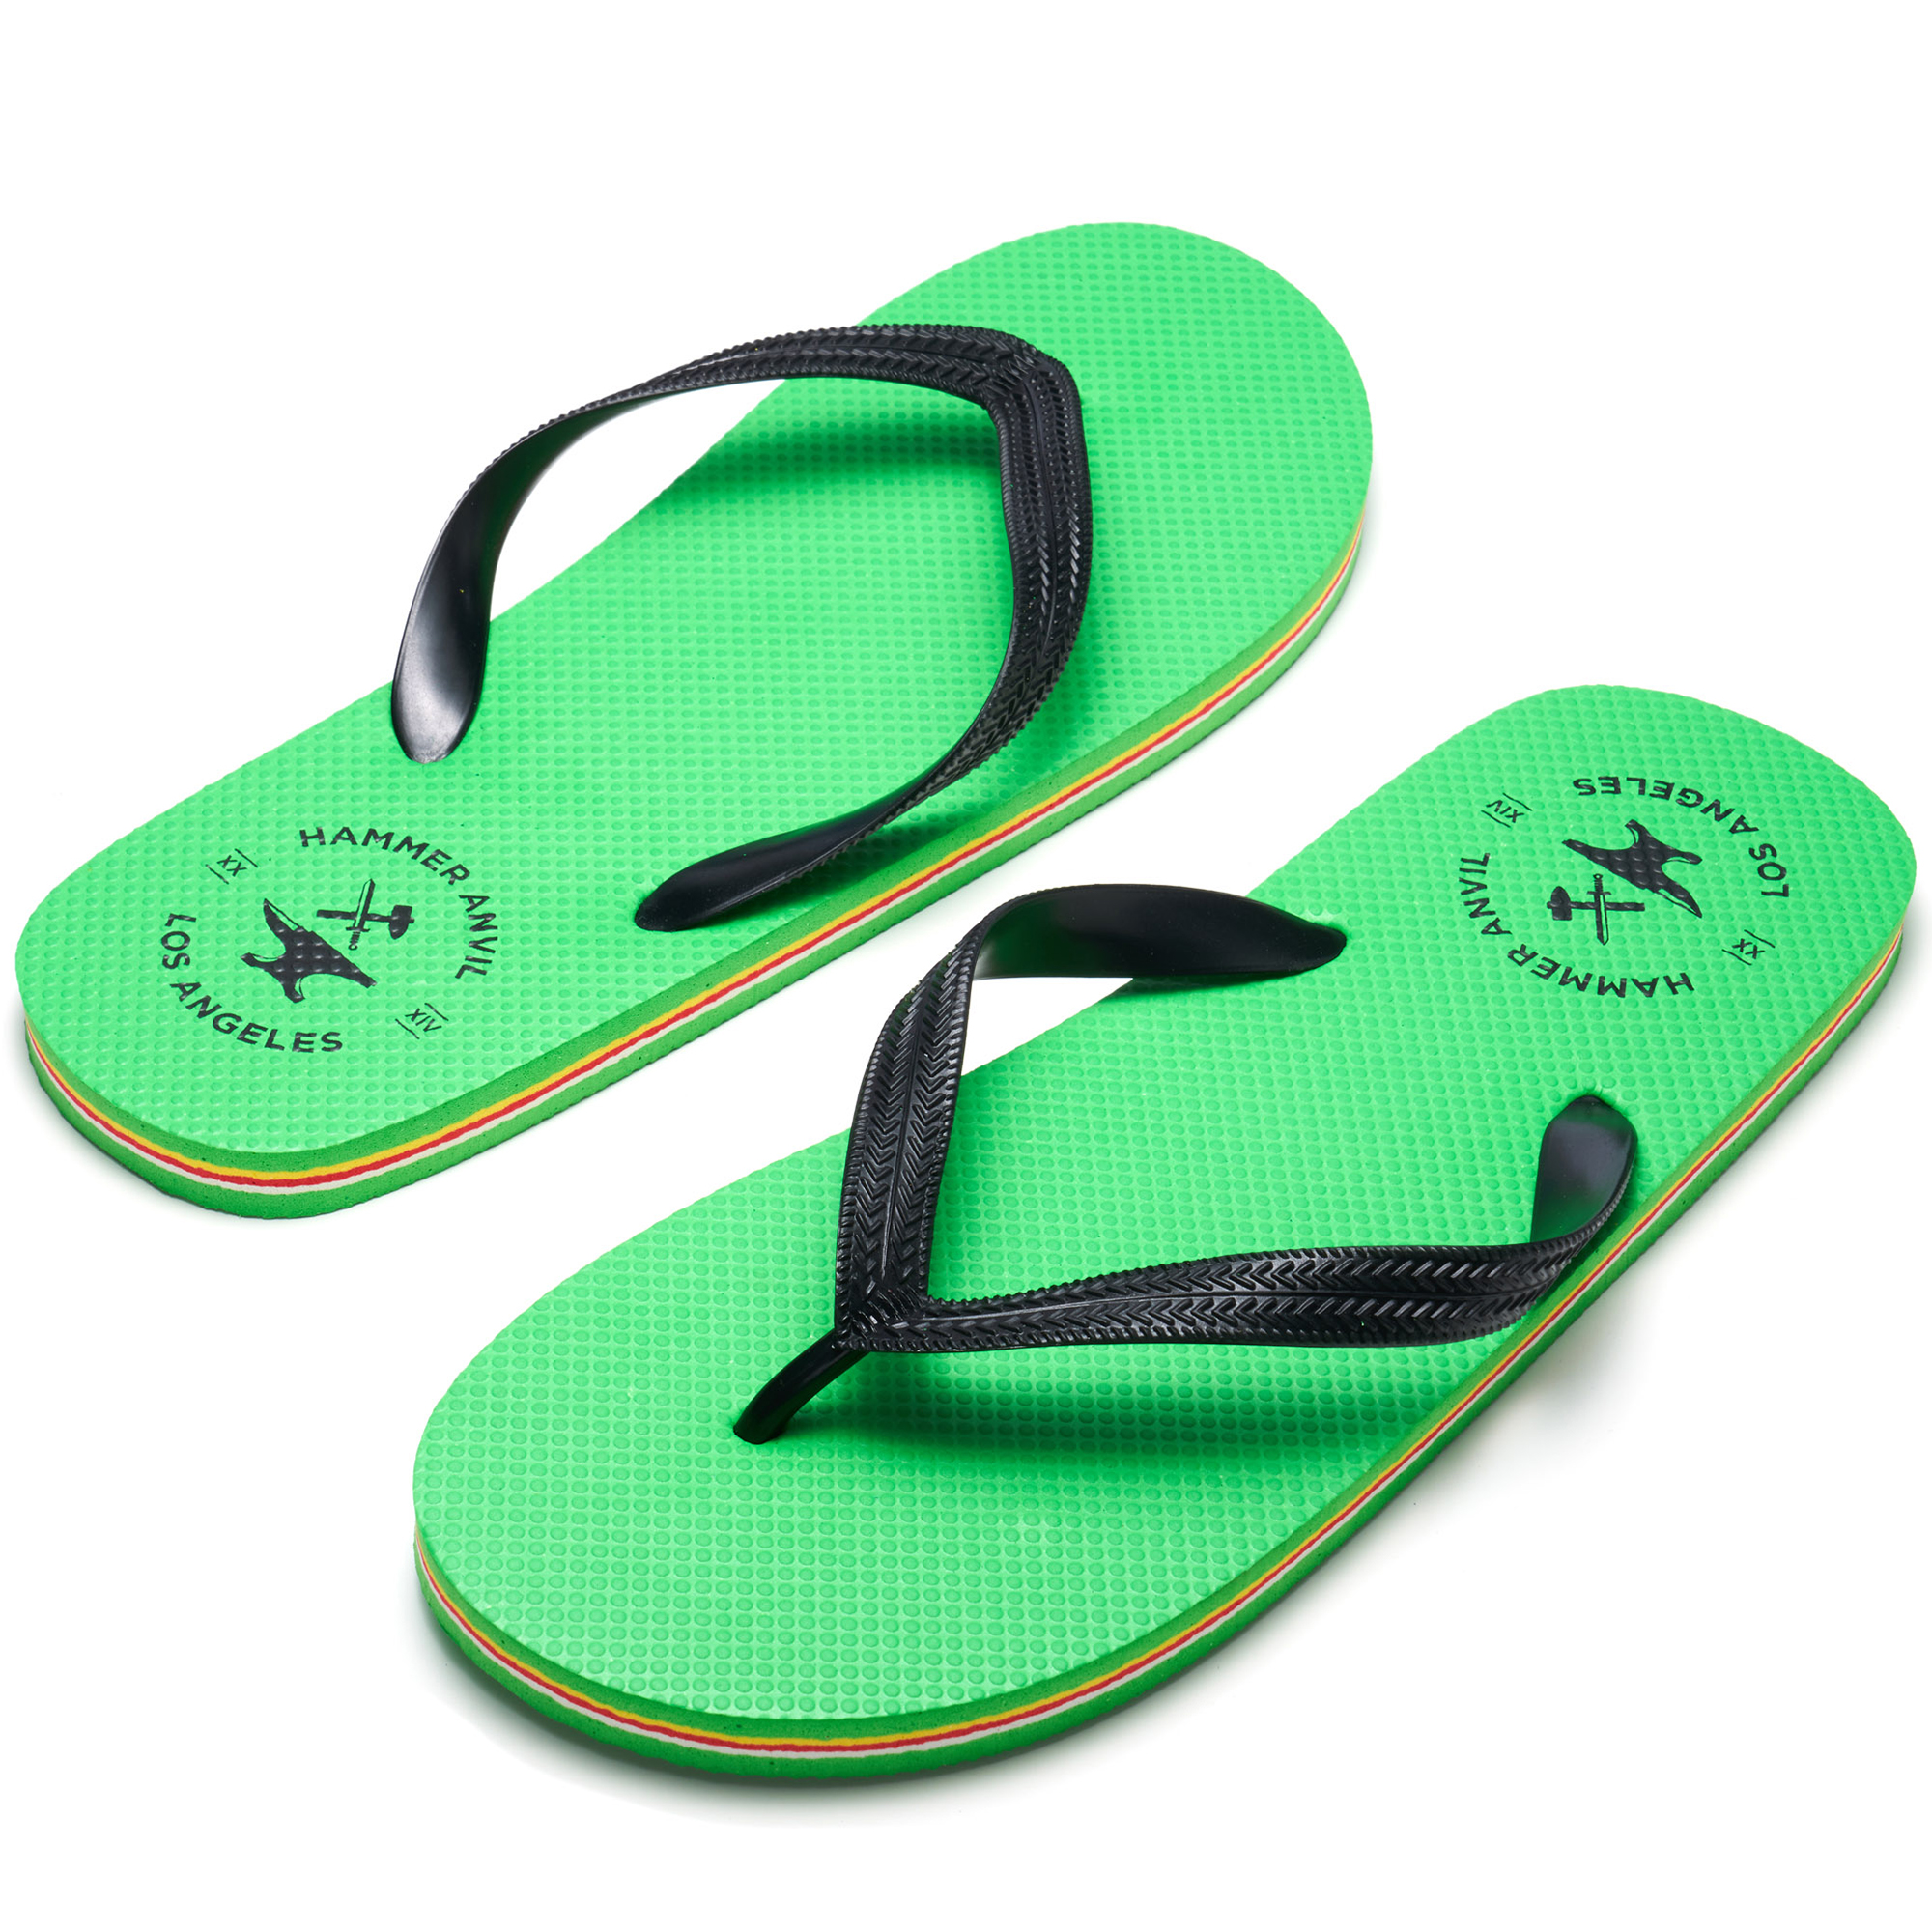 Hammer-Anvil-Mens-Flip-Flops-Casual-Thong-Summer-Sandals-Comfortable-Beach-Shoes thumbnail 22